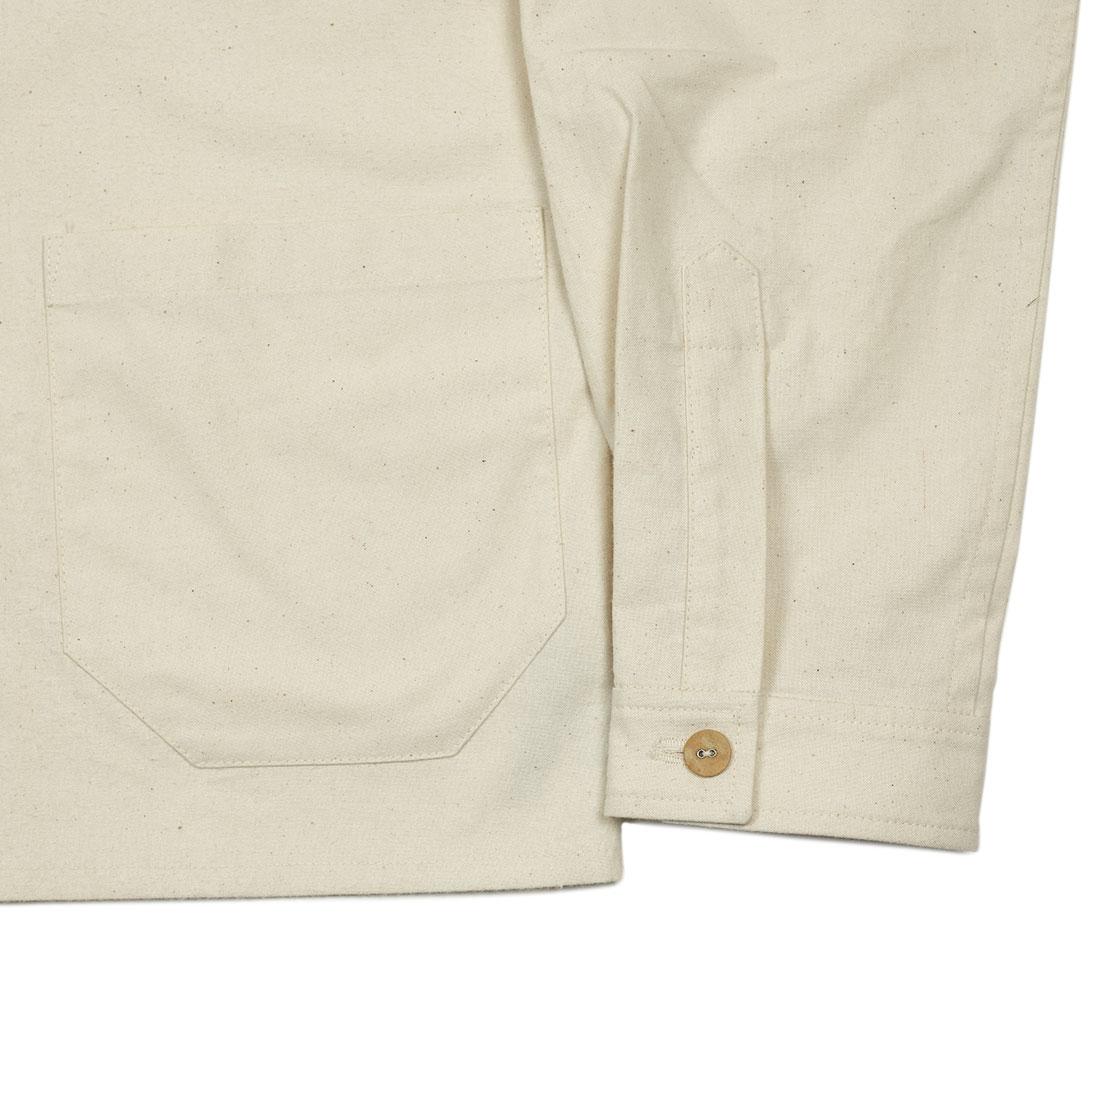 Frank Leder Spring Summer 2021 SS21 Made in Germany deadstock bedlinen shirt jacket (1).jpg